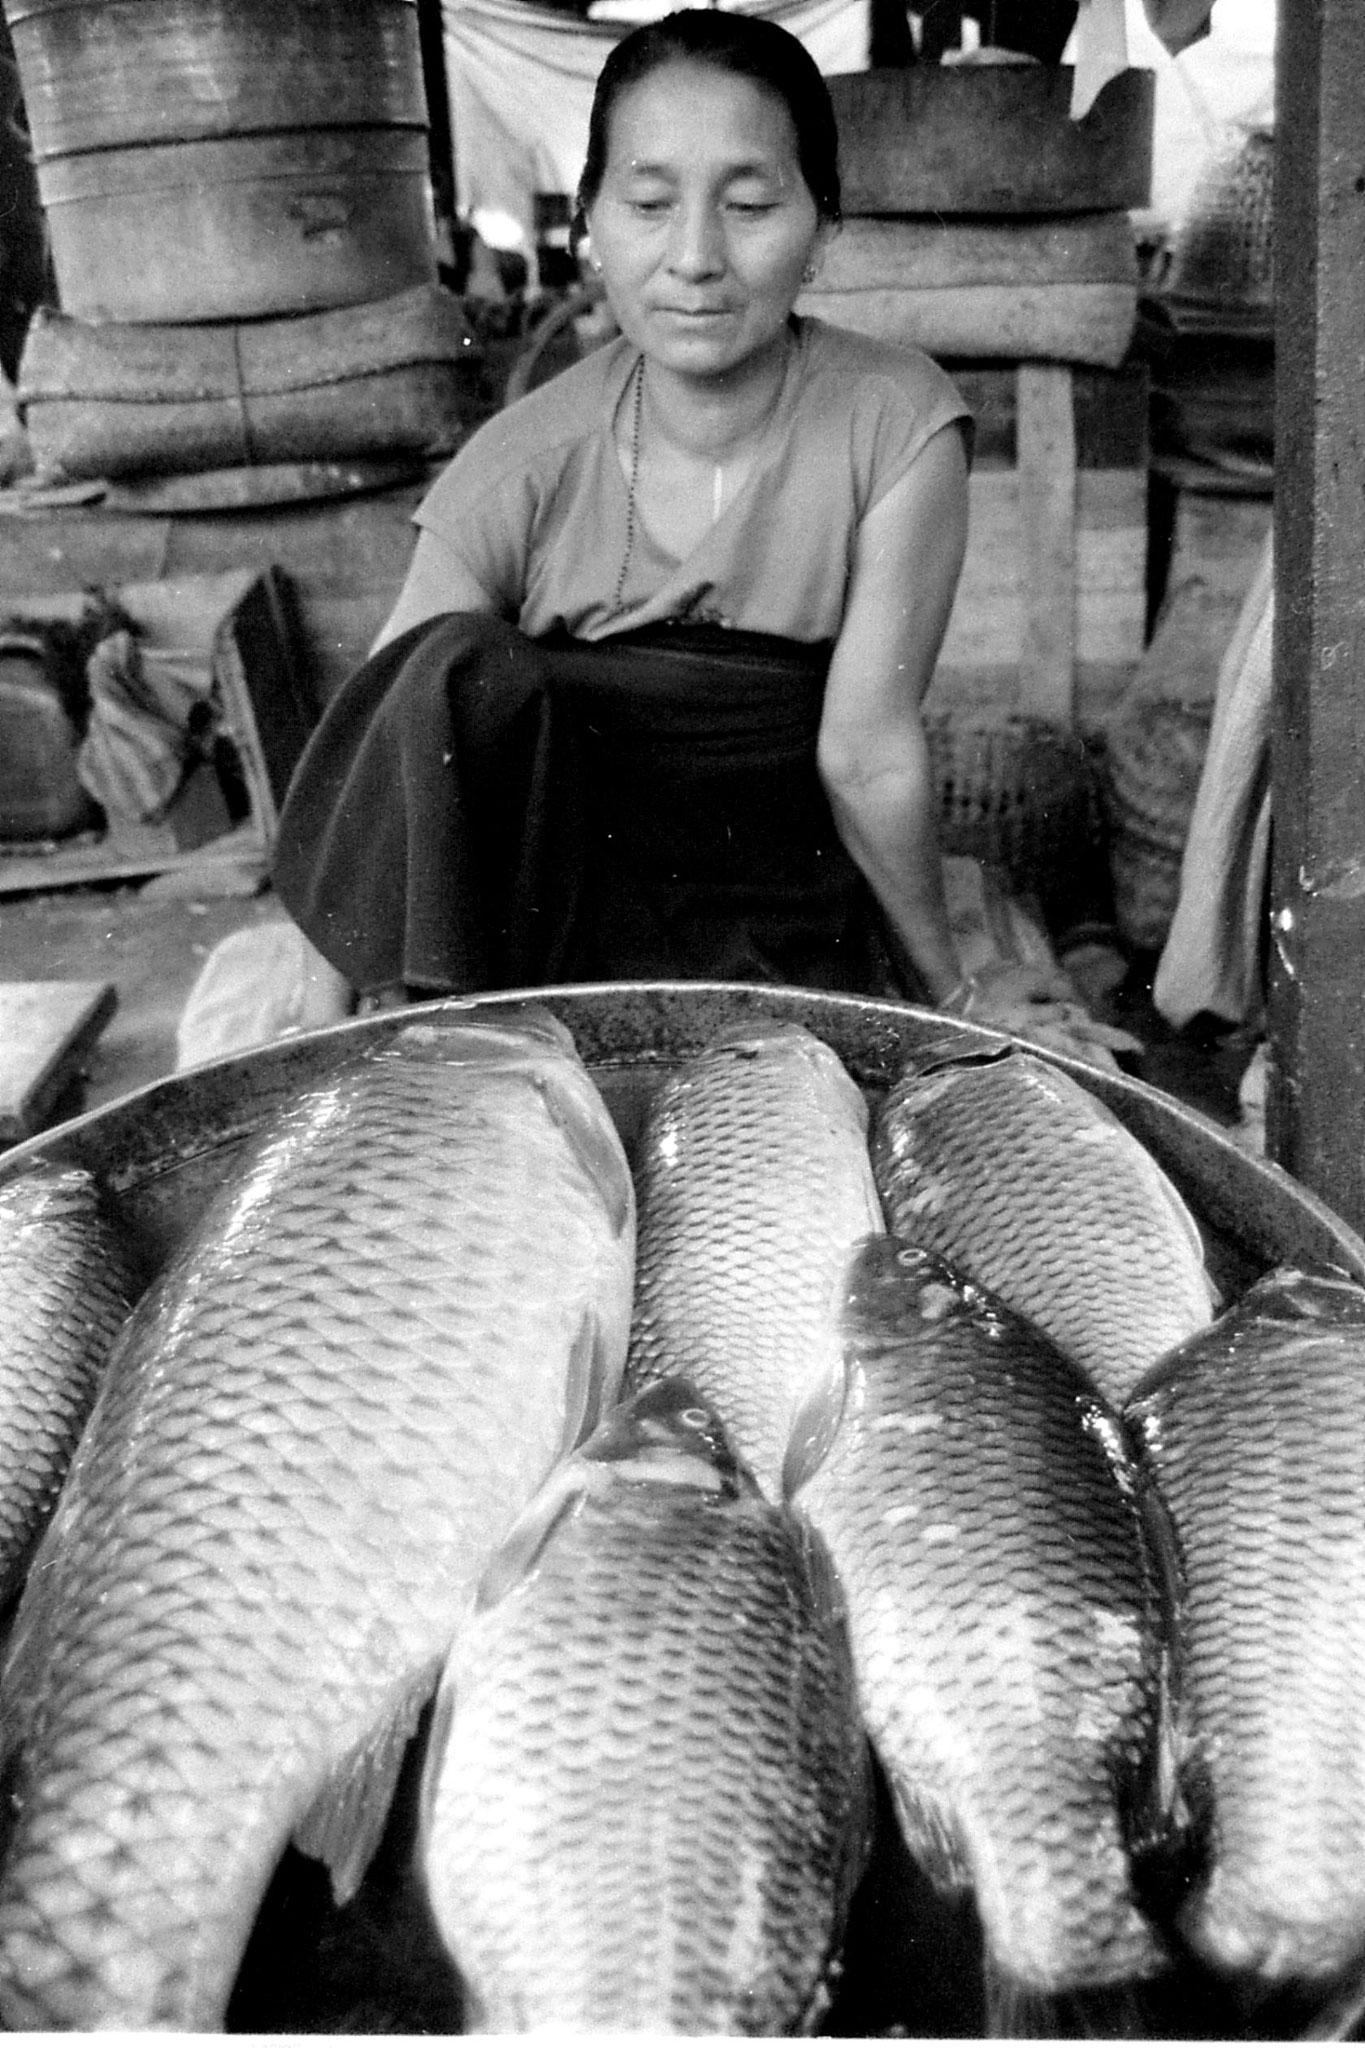 17/4/1990: 7: Imphal women's market